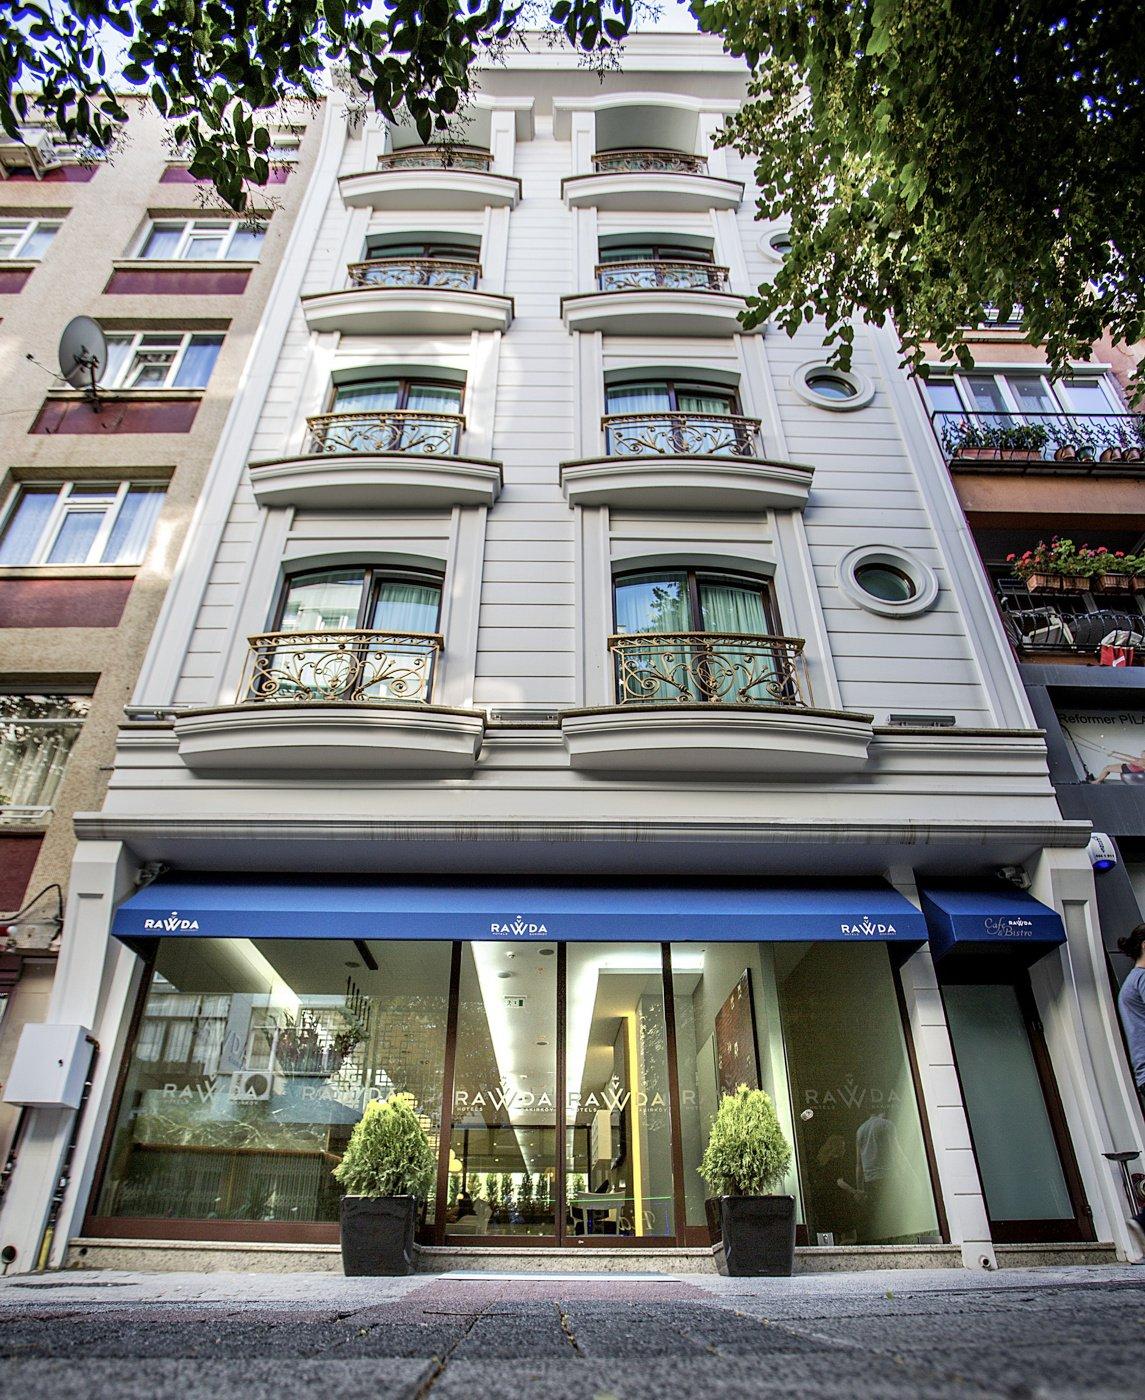 Rawda Hotel Bakirkoy - Turkey - Istanbul